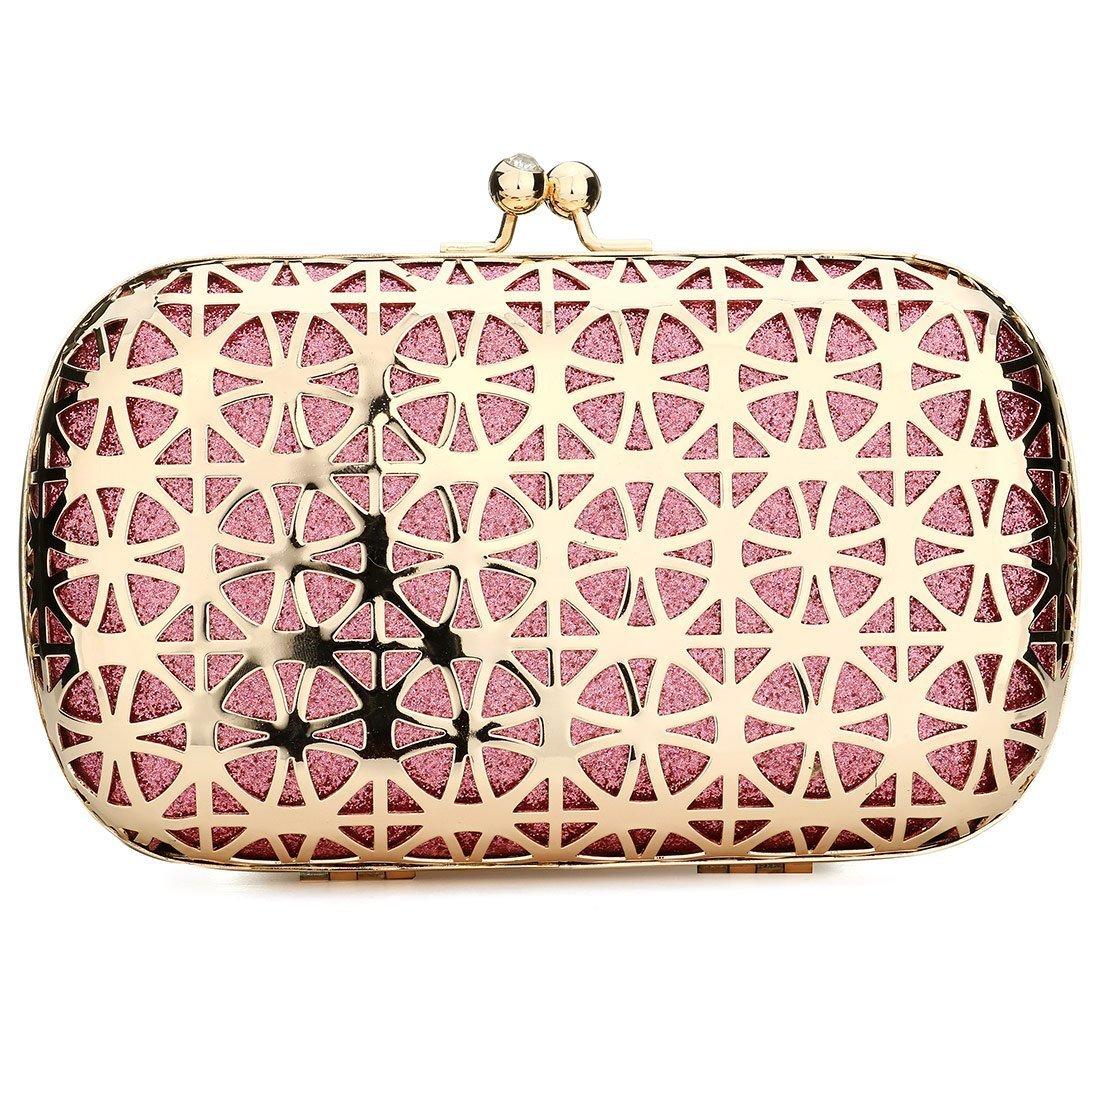 Shiny evening clutch purse fashionable acrylic designer clutch bag evening  clutch handbag for women girls pink 127e3cfe8d0cf